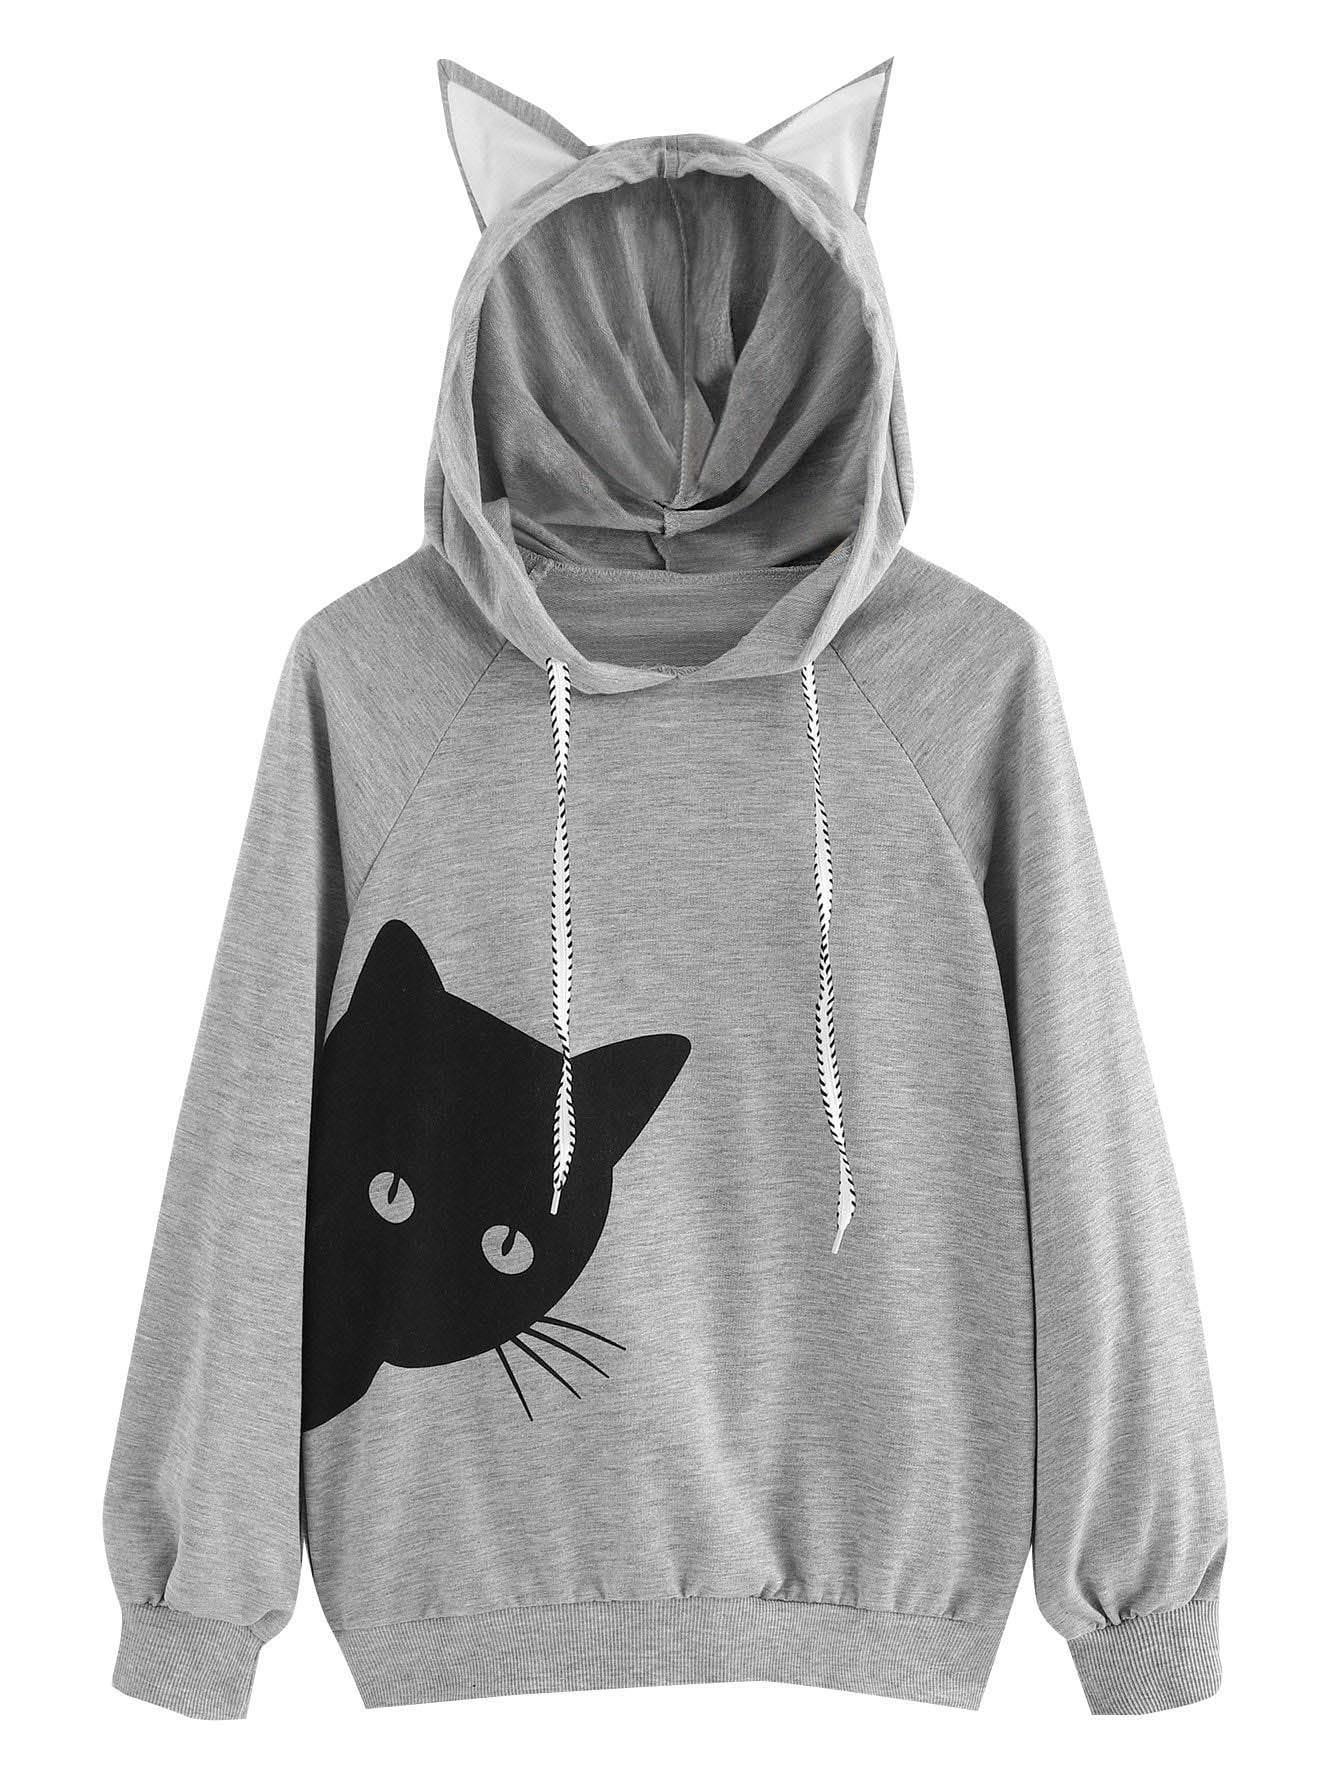 Milumia Women Casual Hoodie Long Sleeves Cat Ear Novelty Lightweight Sweatshirt